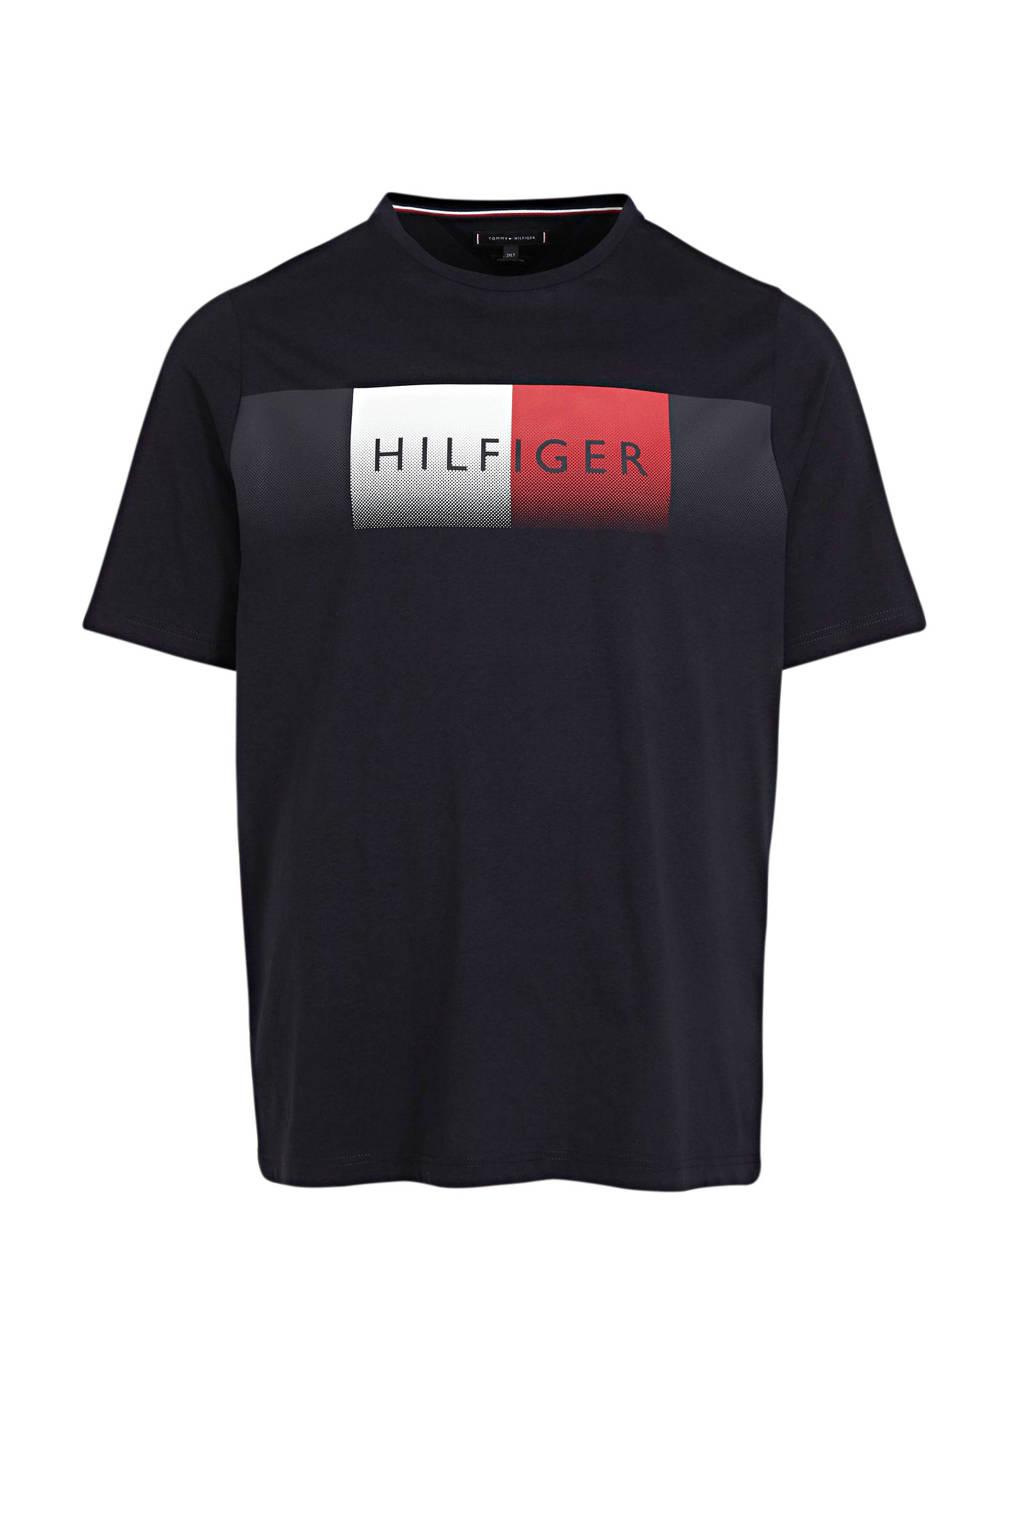 Tommy Hilfiger Big & Tall +size T-shirt van biologisch katoen donkerblauw, Donkerblauw